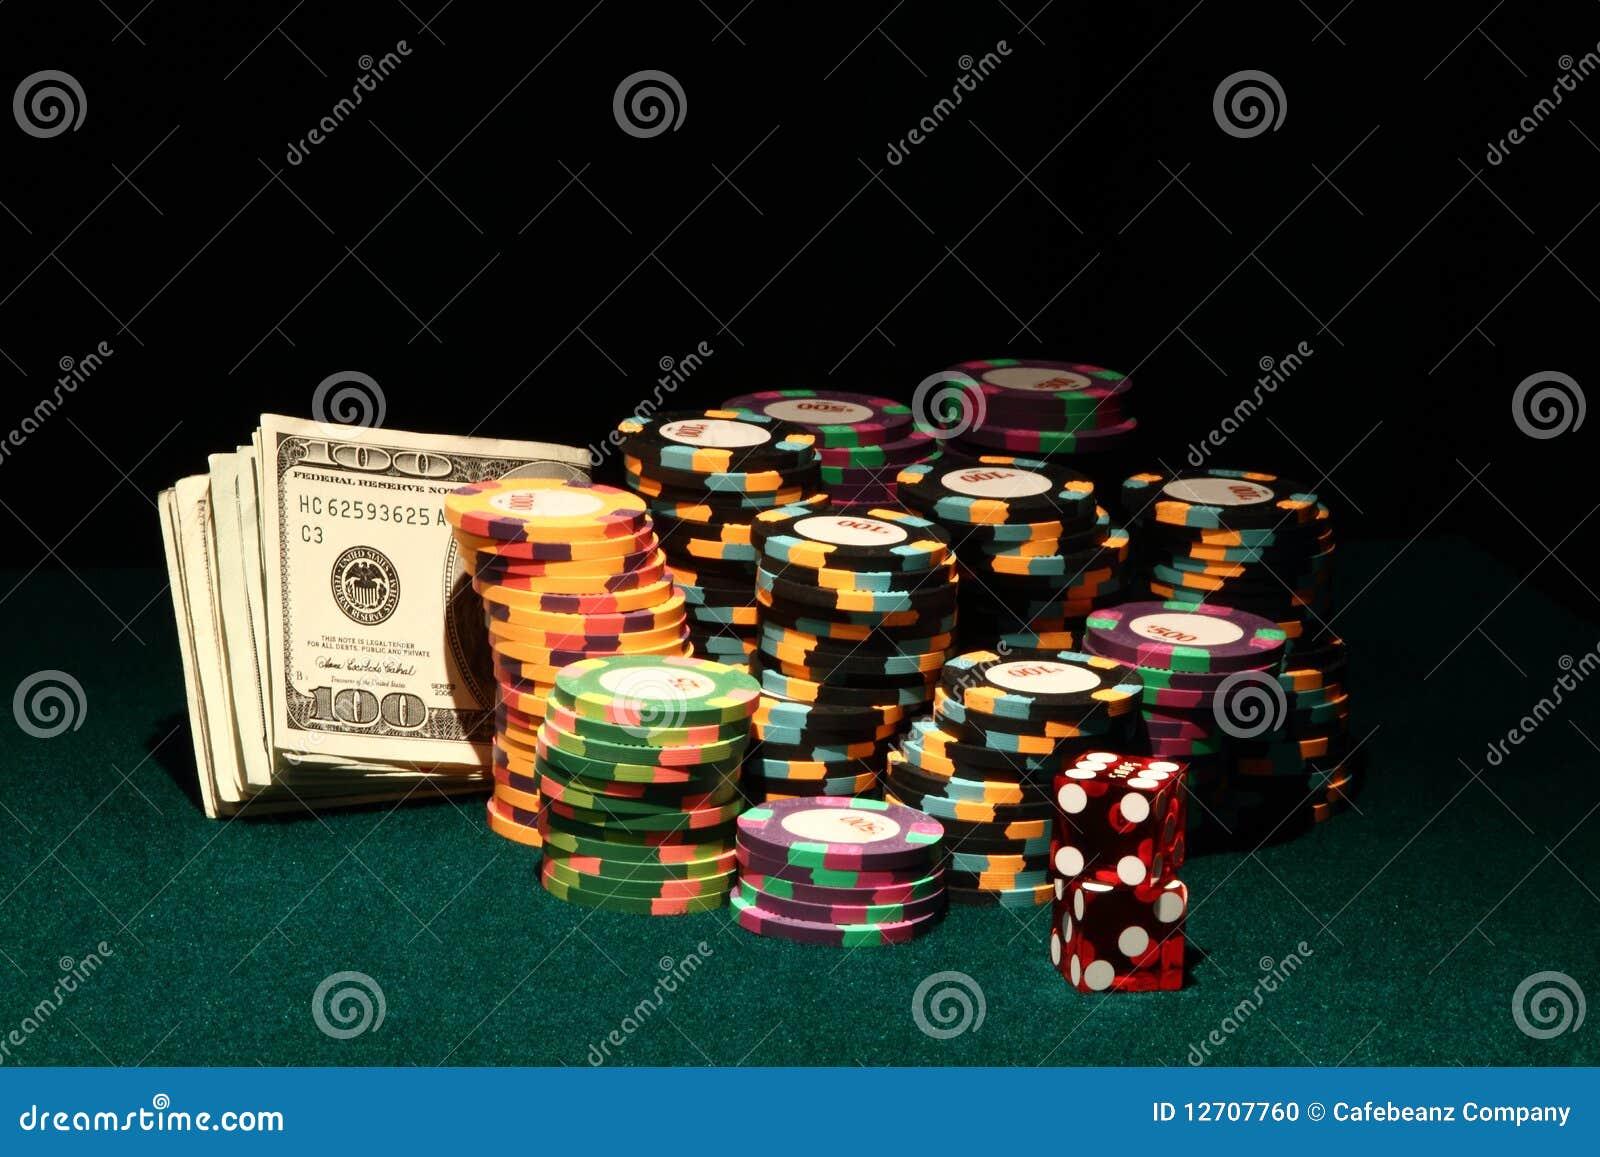 casino craps online casino holidays